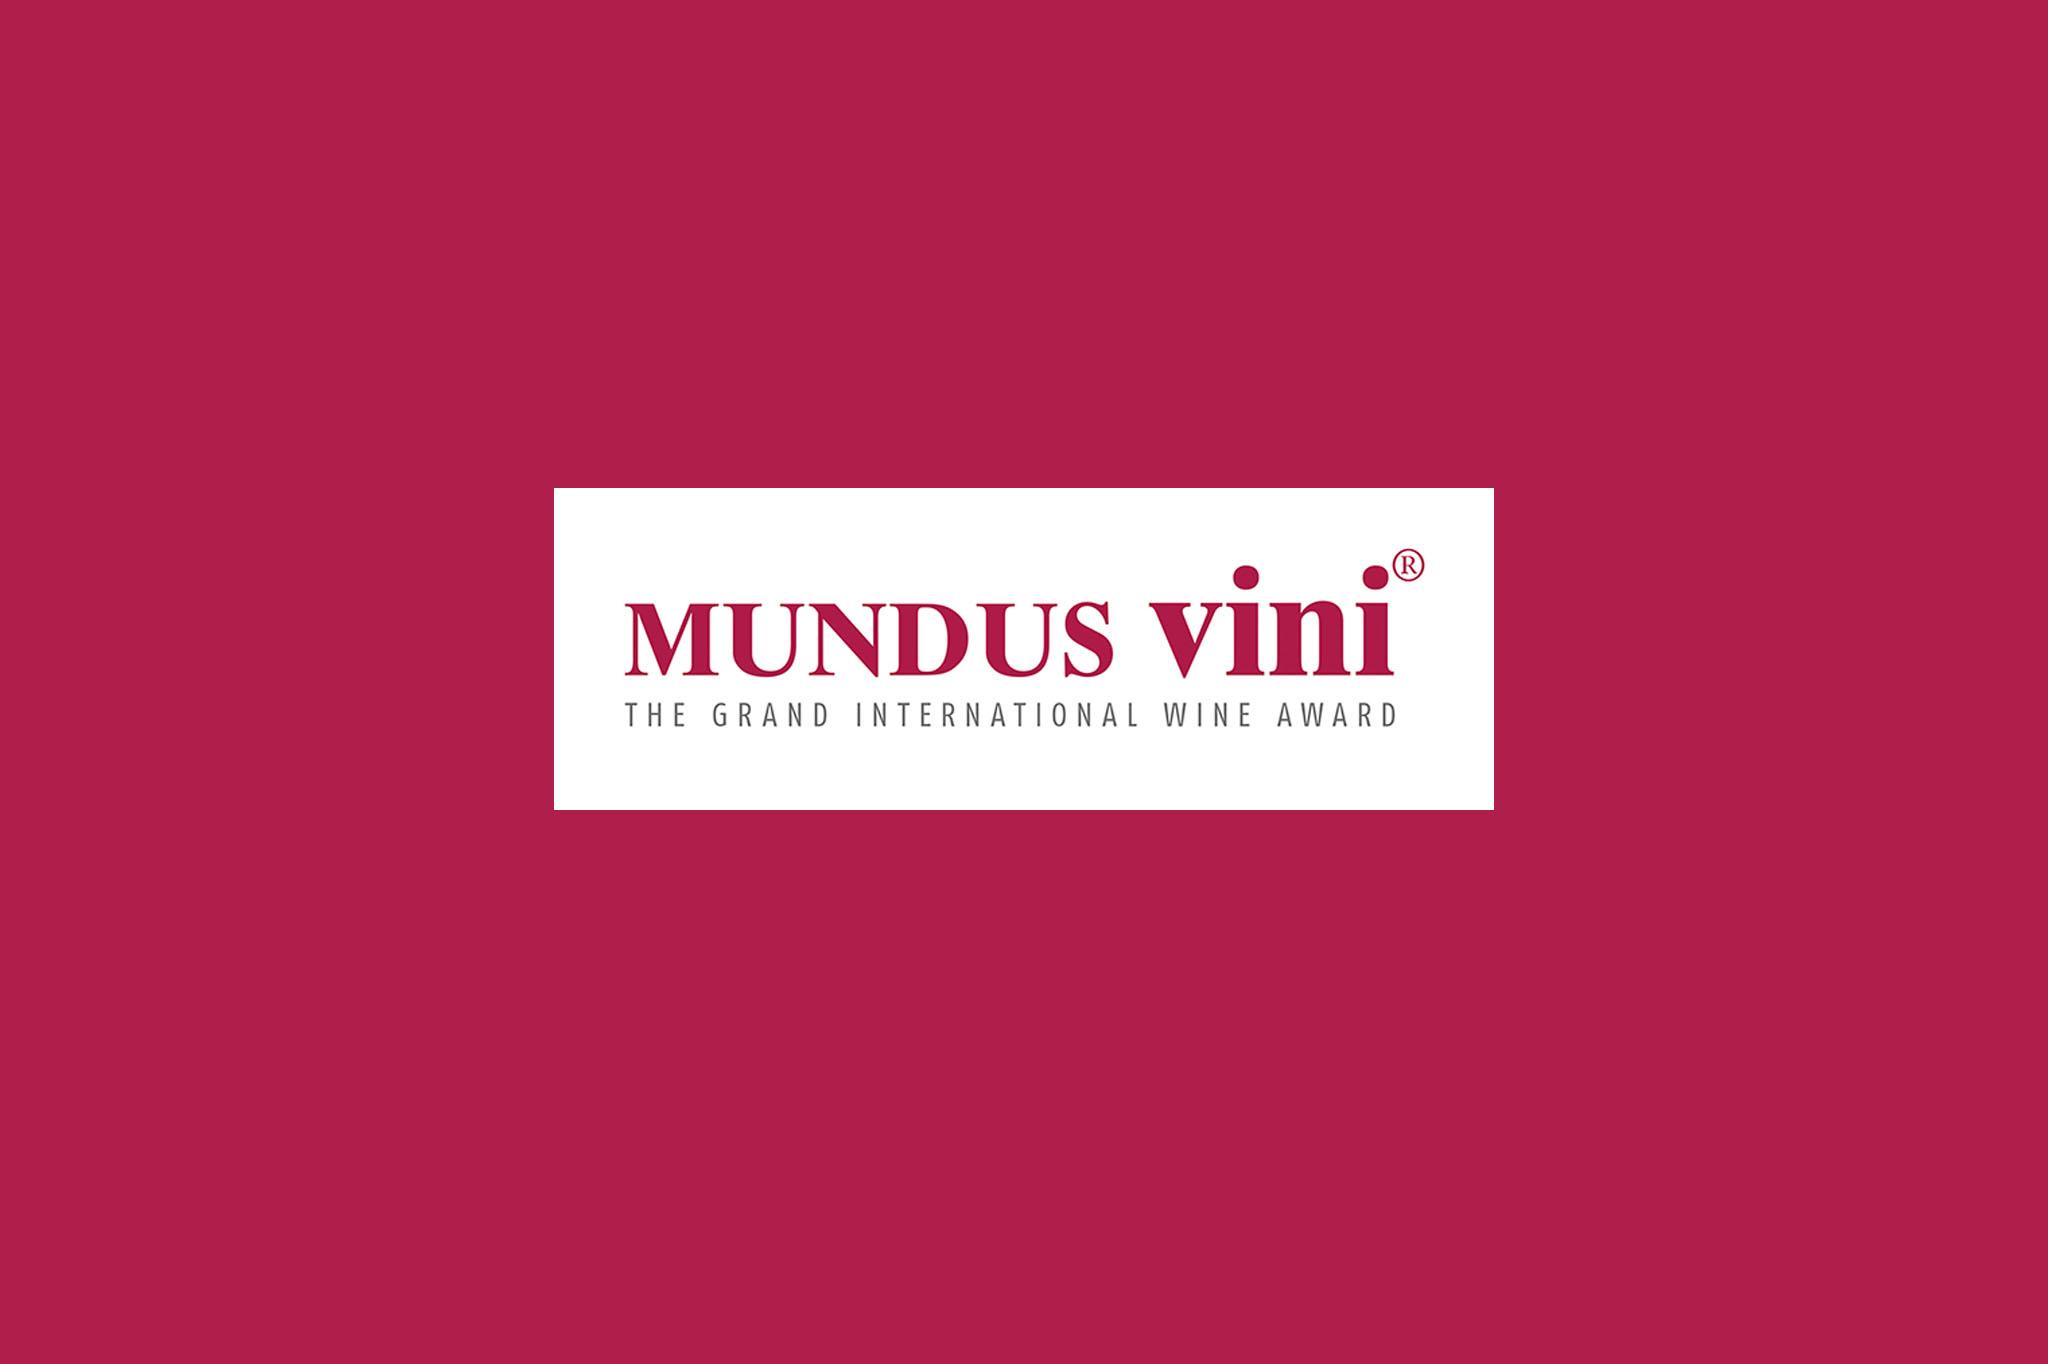 The wines of Hispanobodegas achieved a crushing success at Mundus Vini